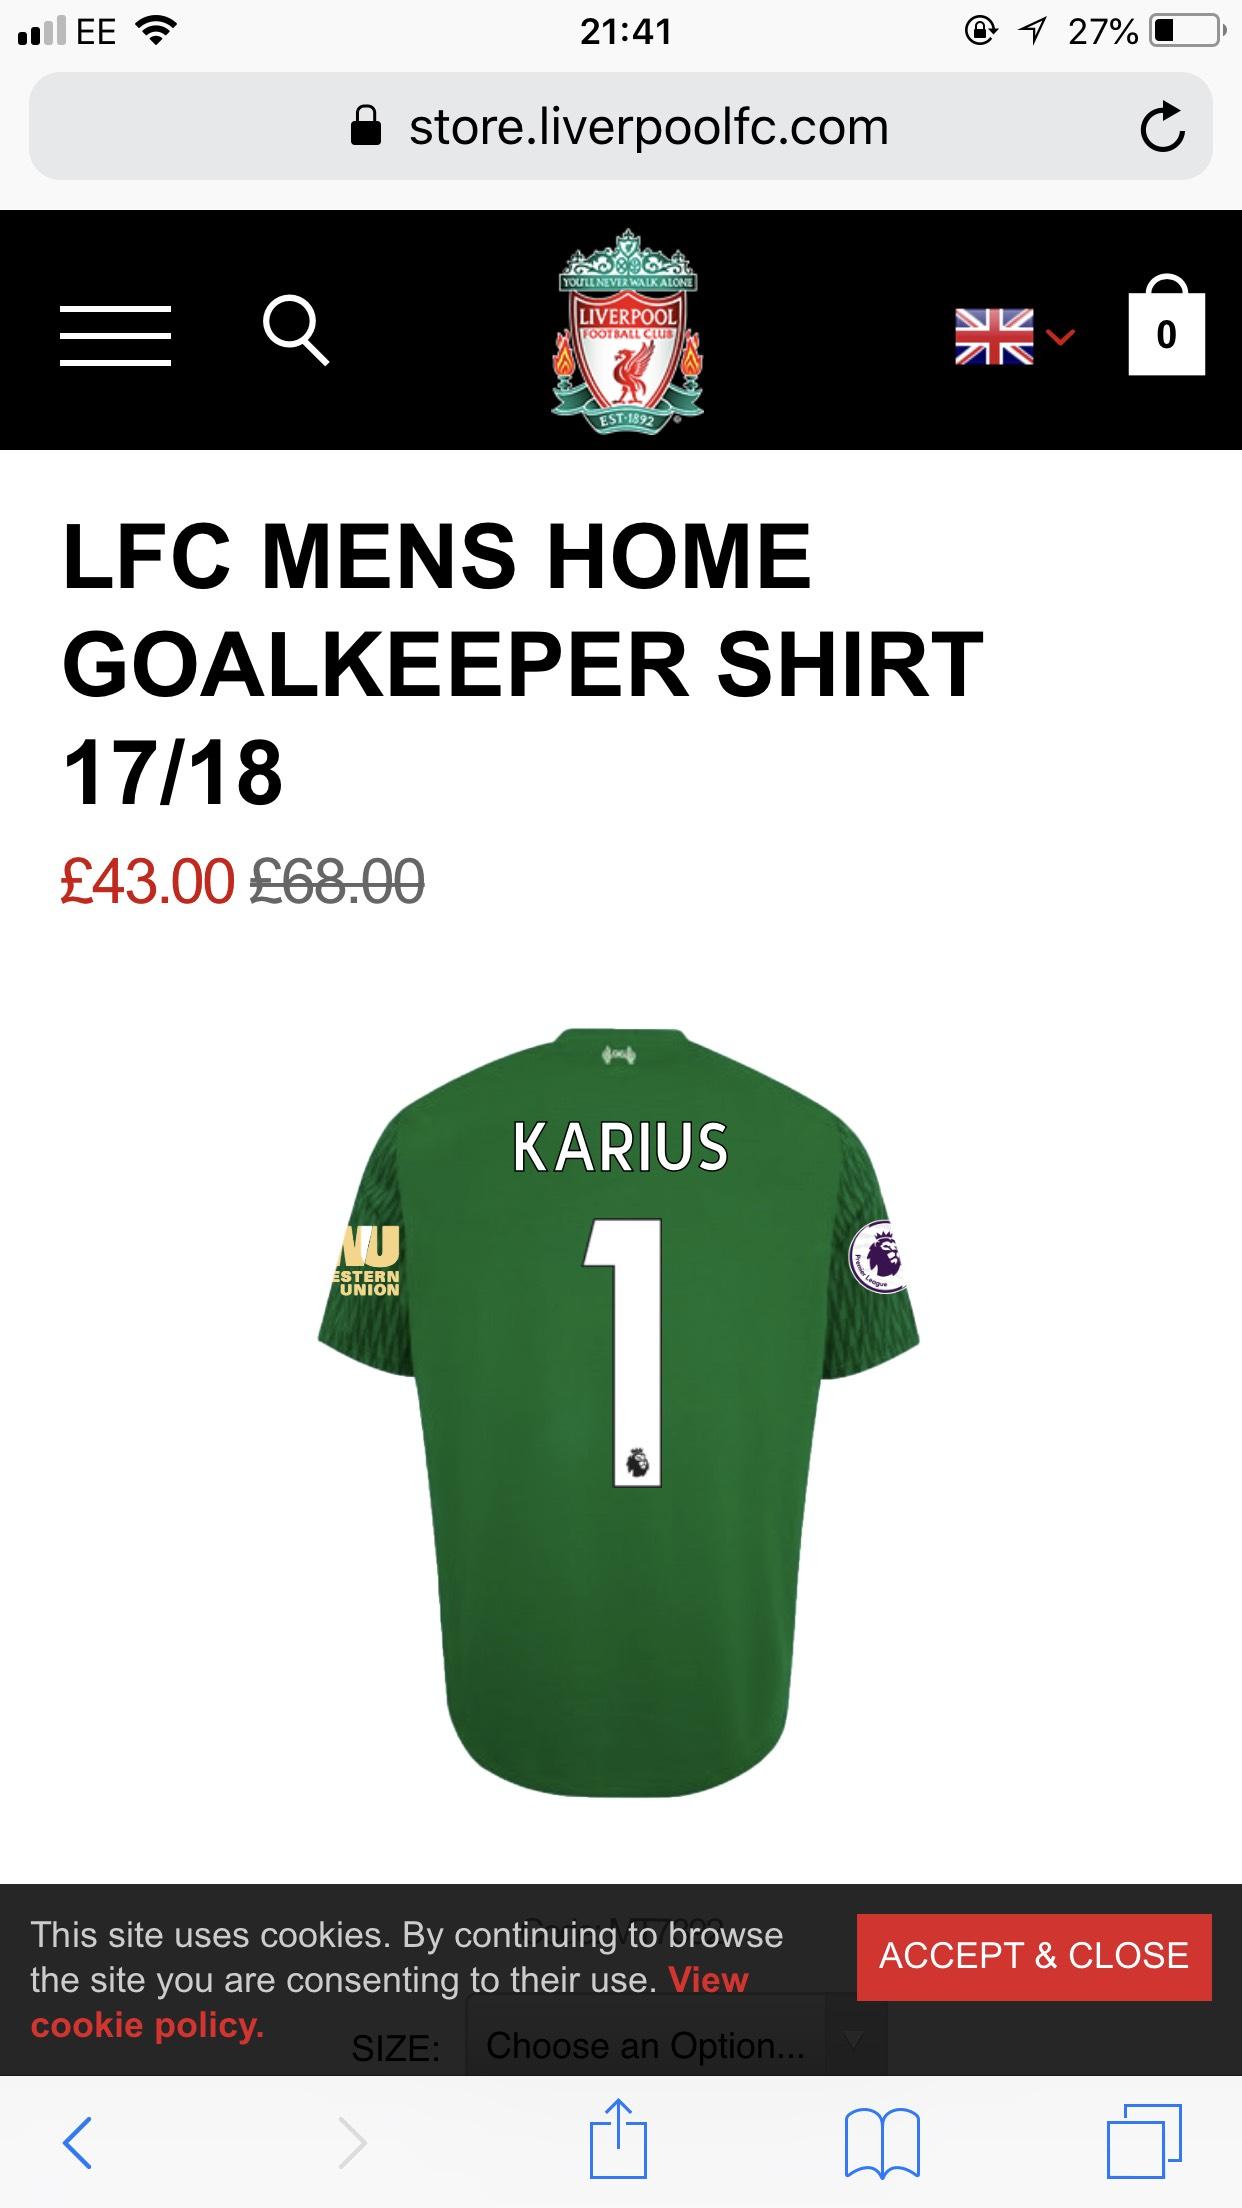 LFC MENS HOME GOALKEEPER SHIRT 17/18 Karius - £40 (or £25 unpersonalised) @ Liverpool FC Store